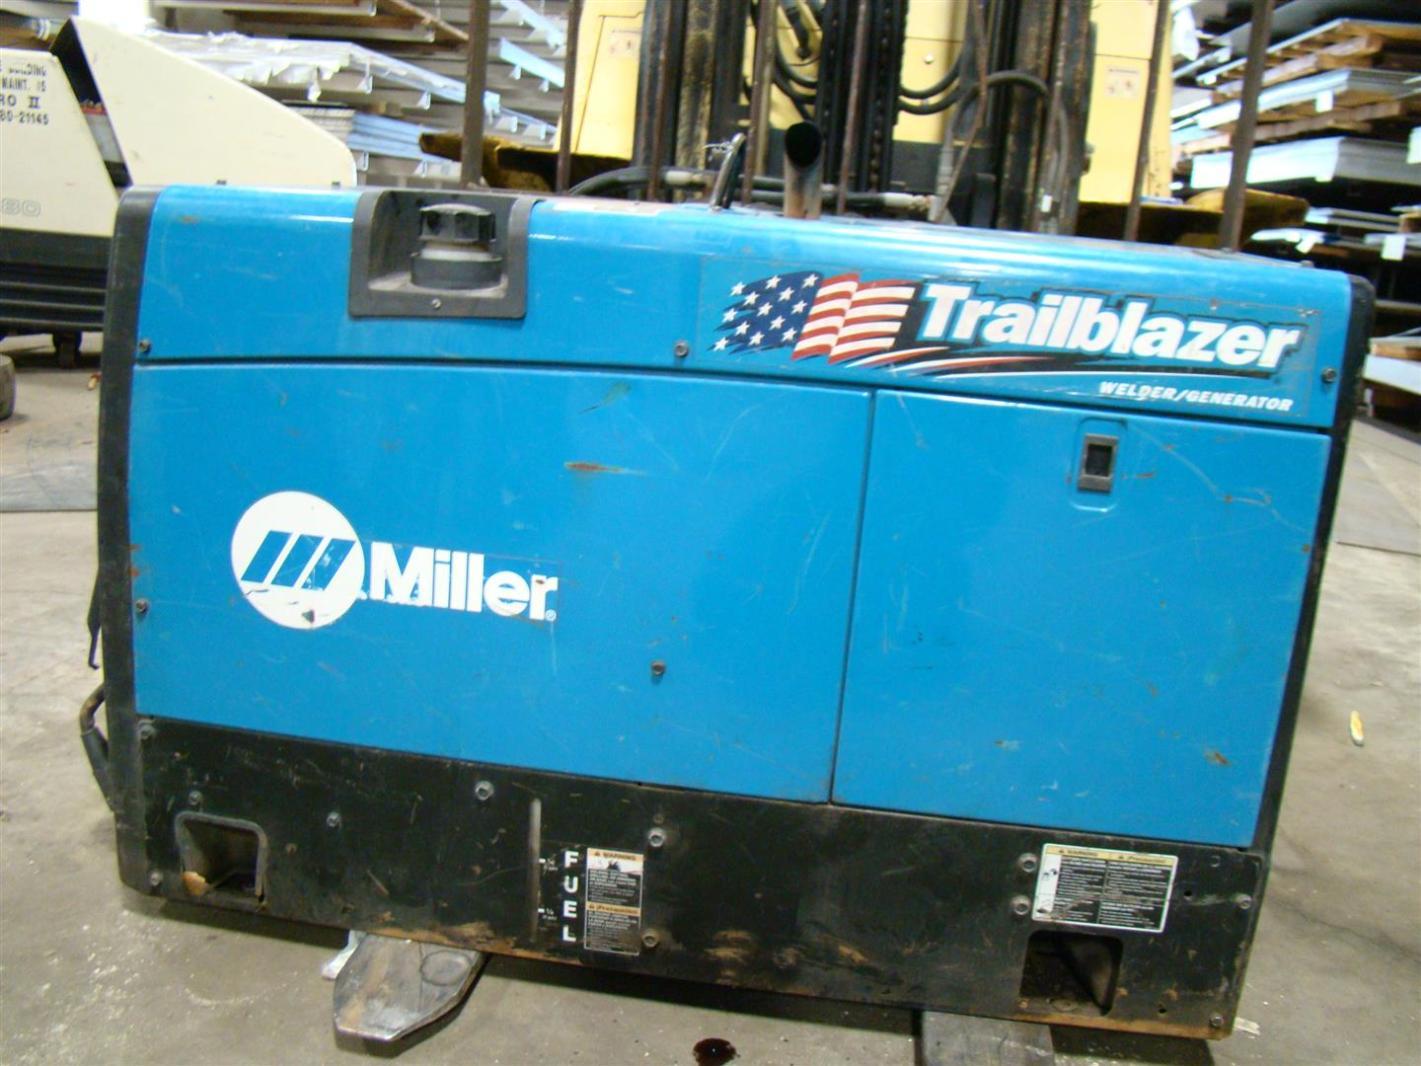 Trailblazer 302